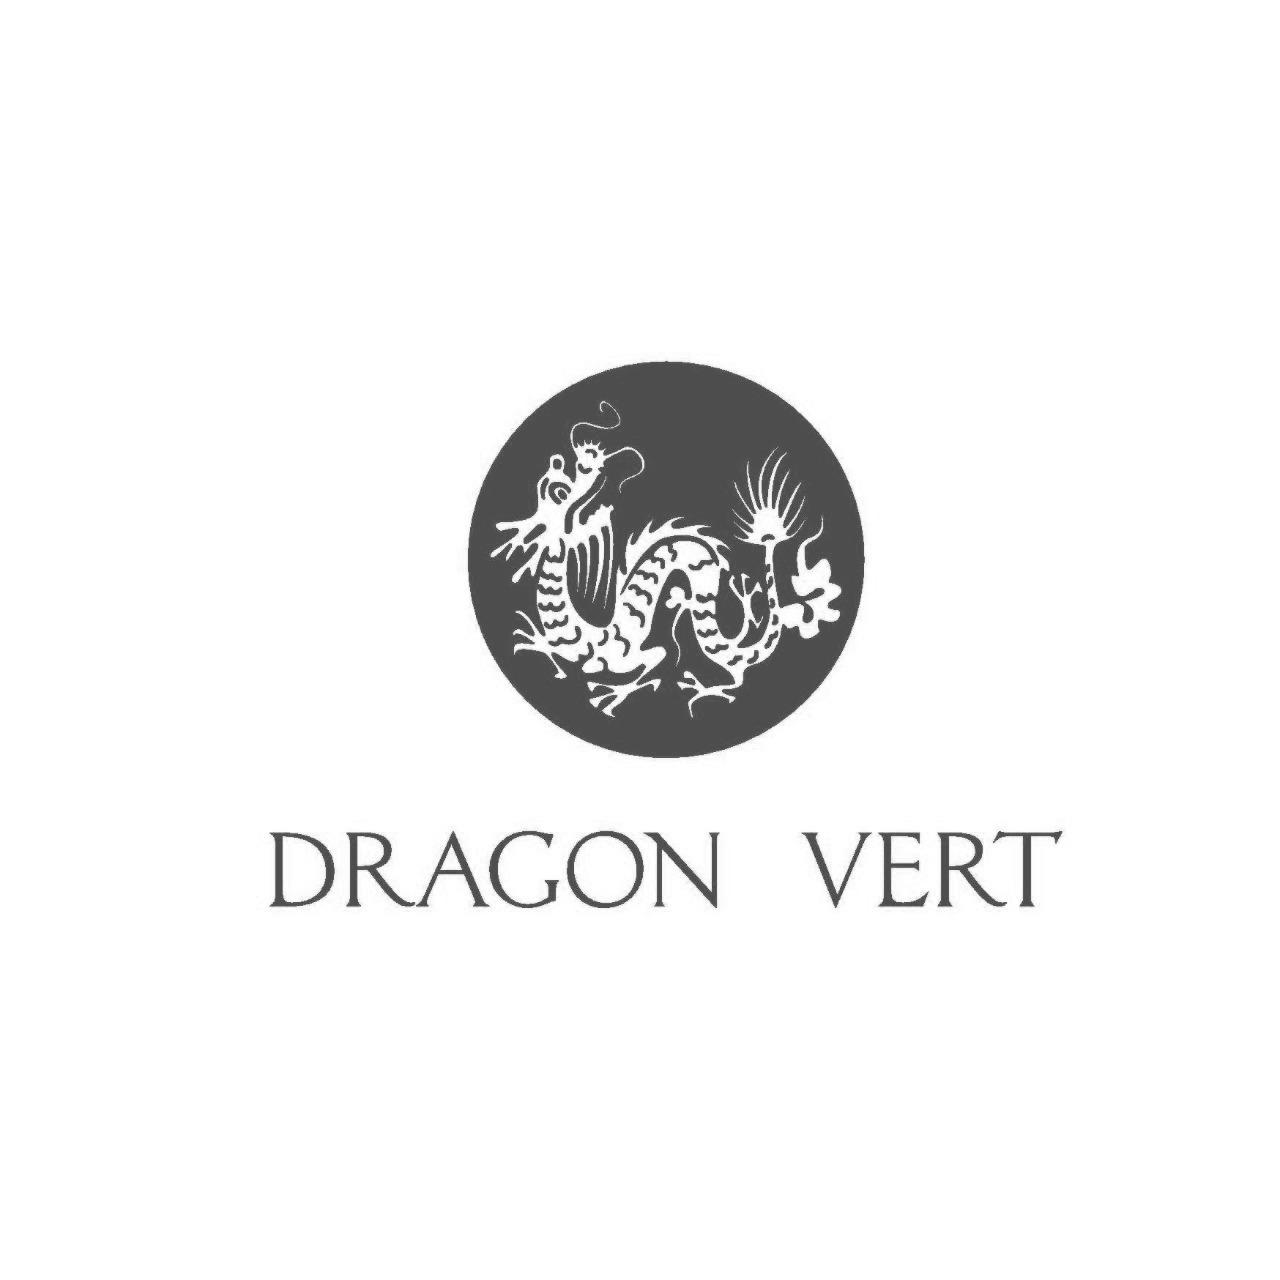 Dragon Vert- Blk Logo